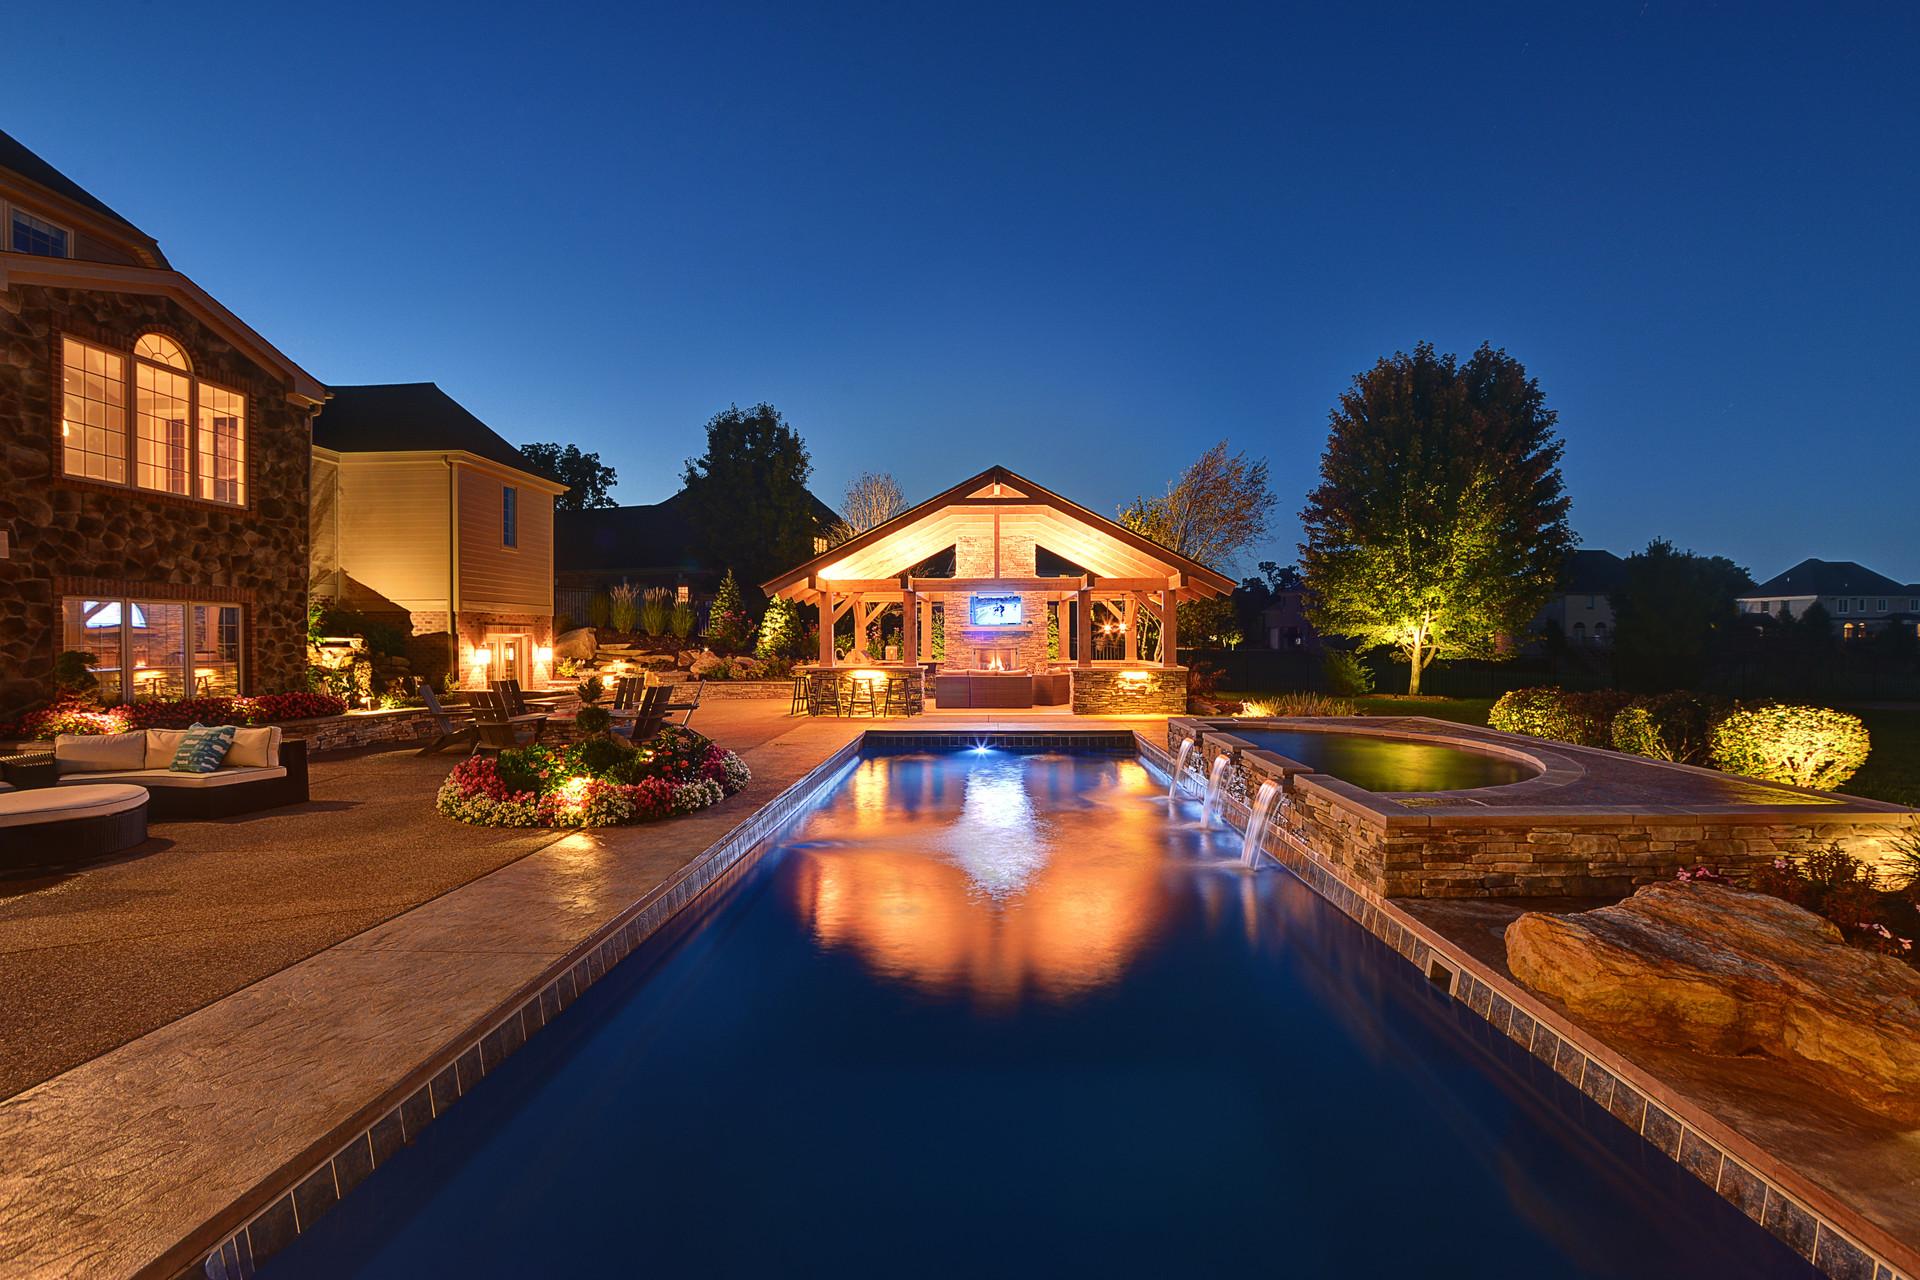 pool and pavillion at night.jpg